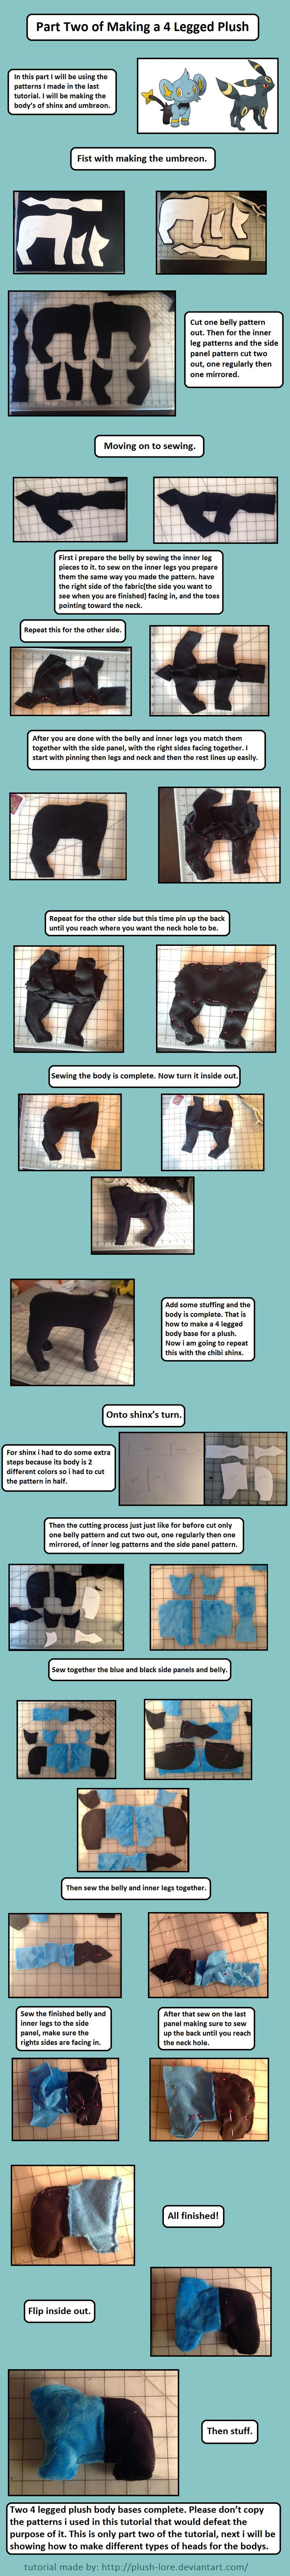 4 legged plush tutorial part 2 by Plush-Lore.deviantart.com on @DeviantArt